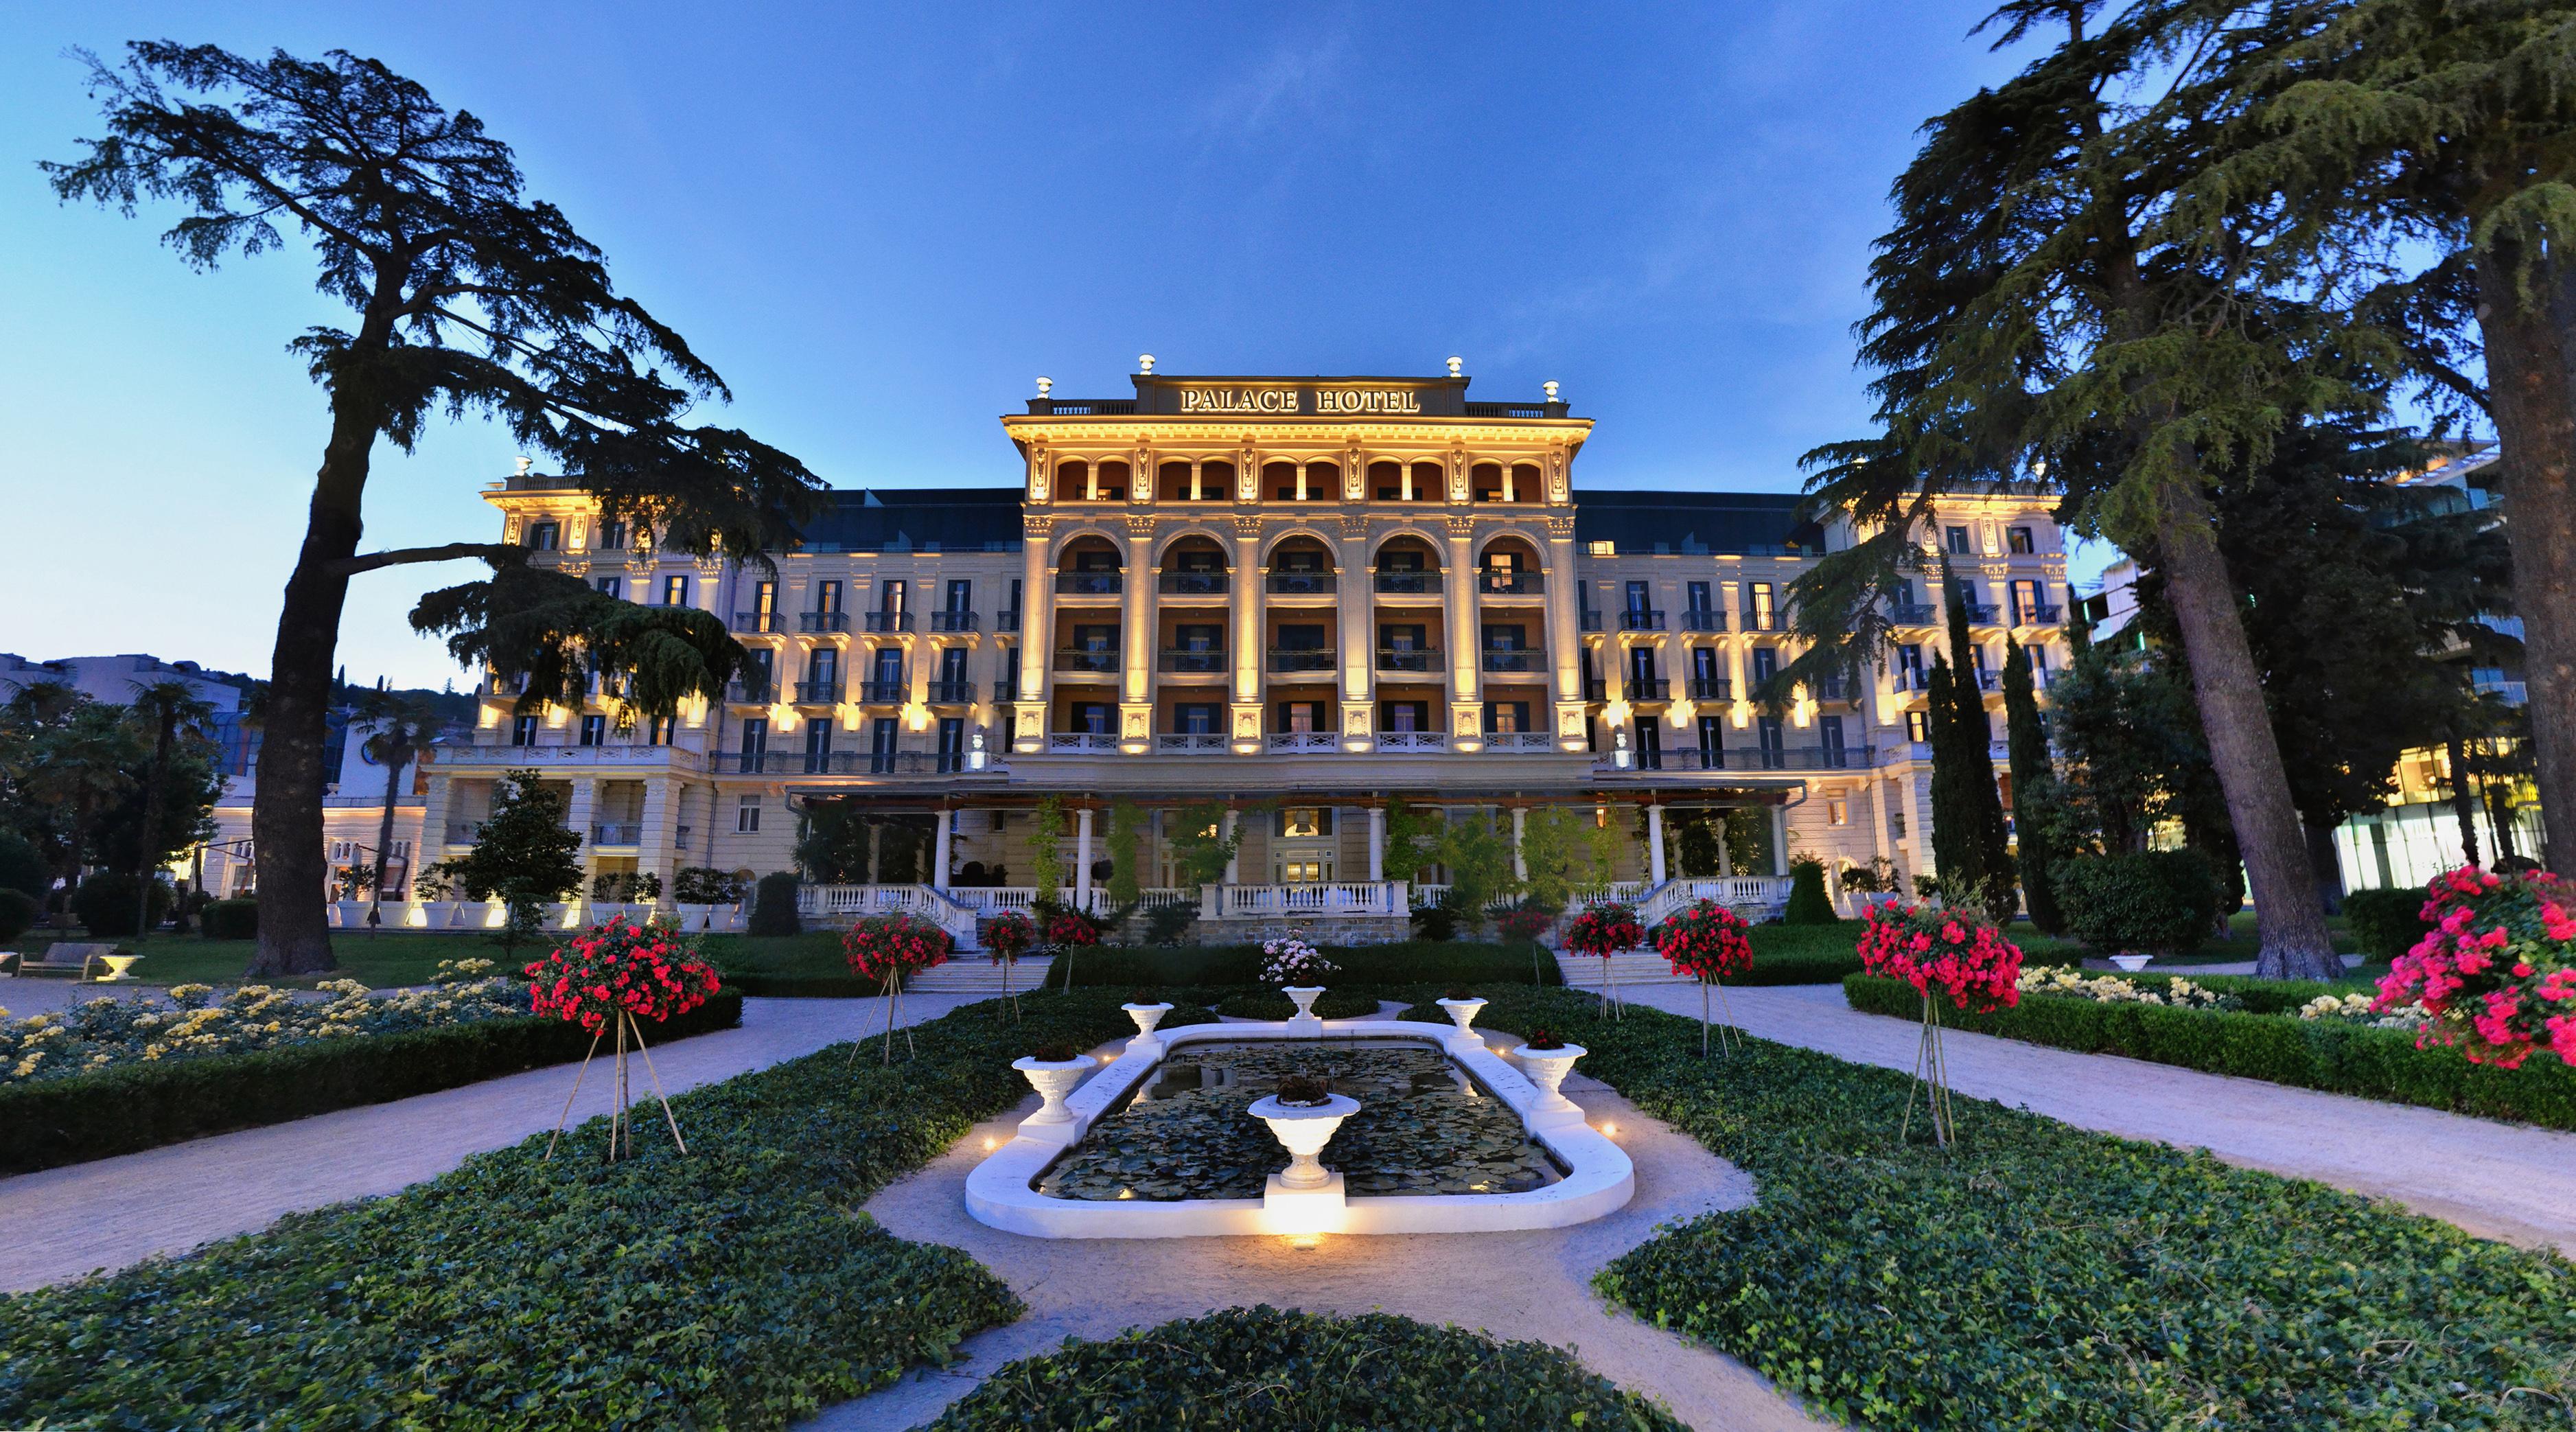 Kempinski Hotel Portoroz Slovenia Secrets Edition - Palace-hotel-in-slovenia